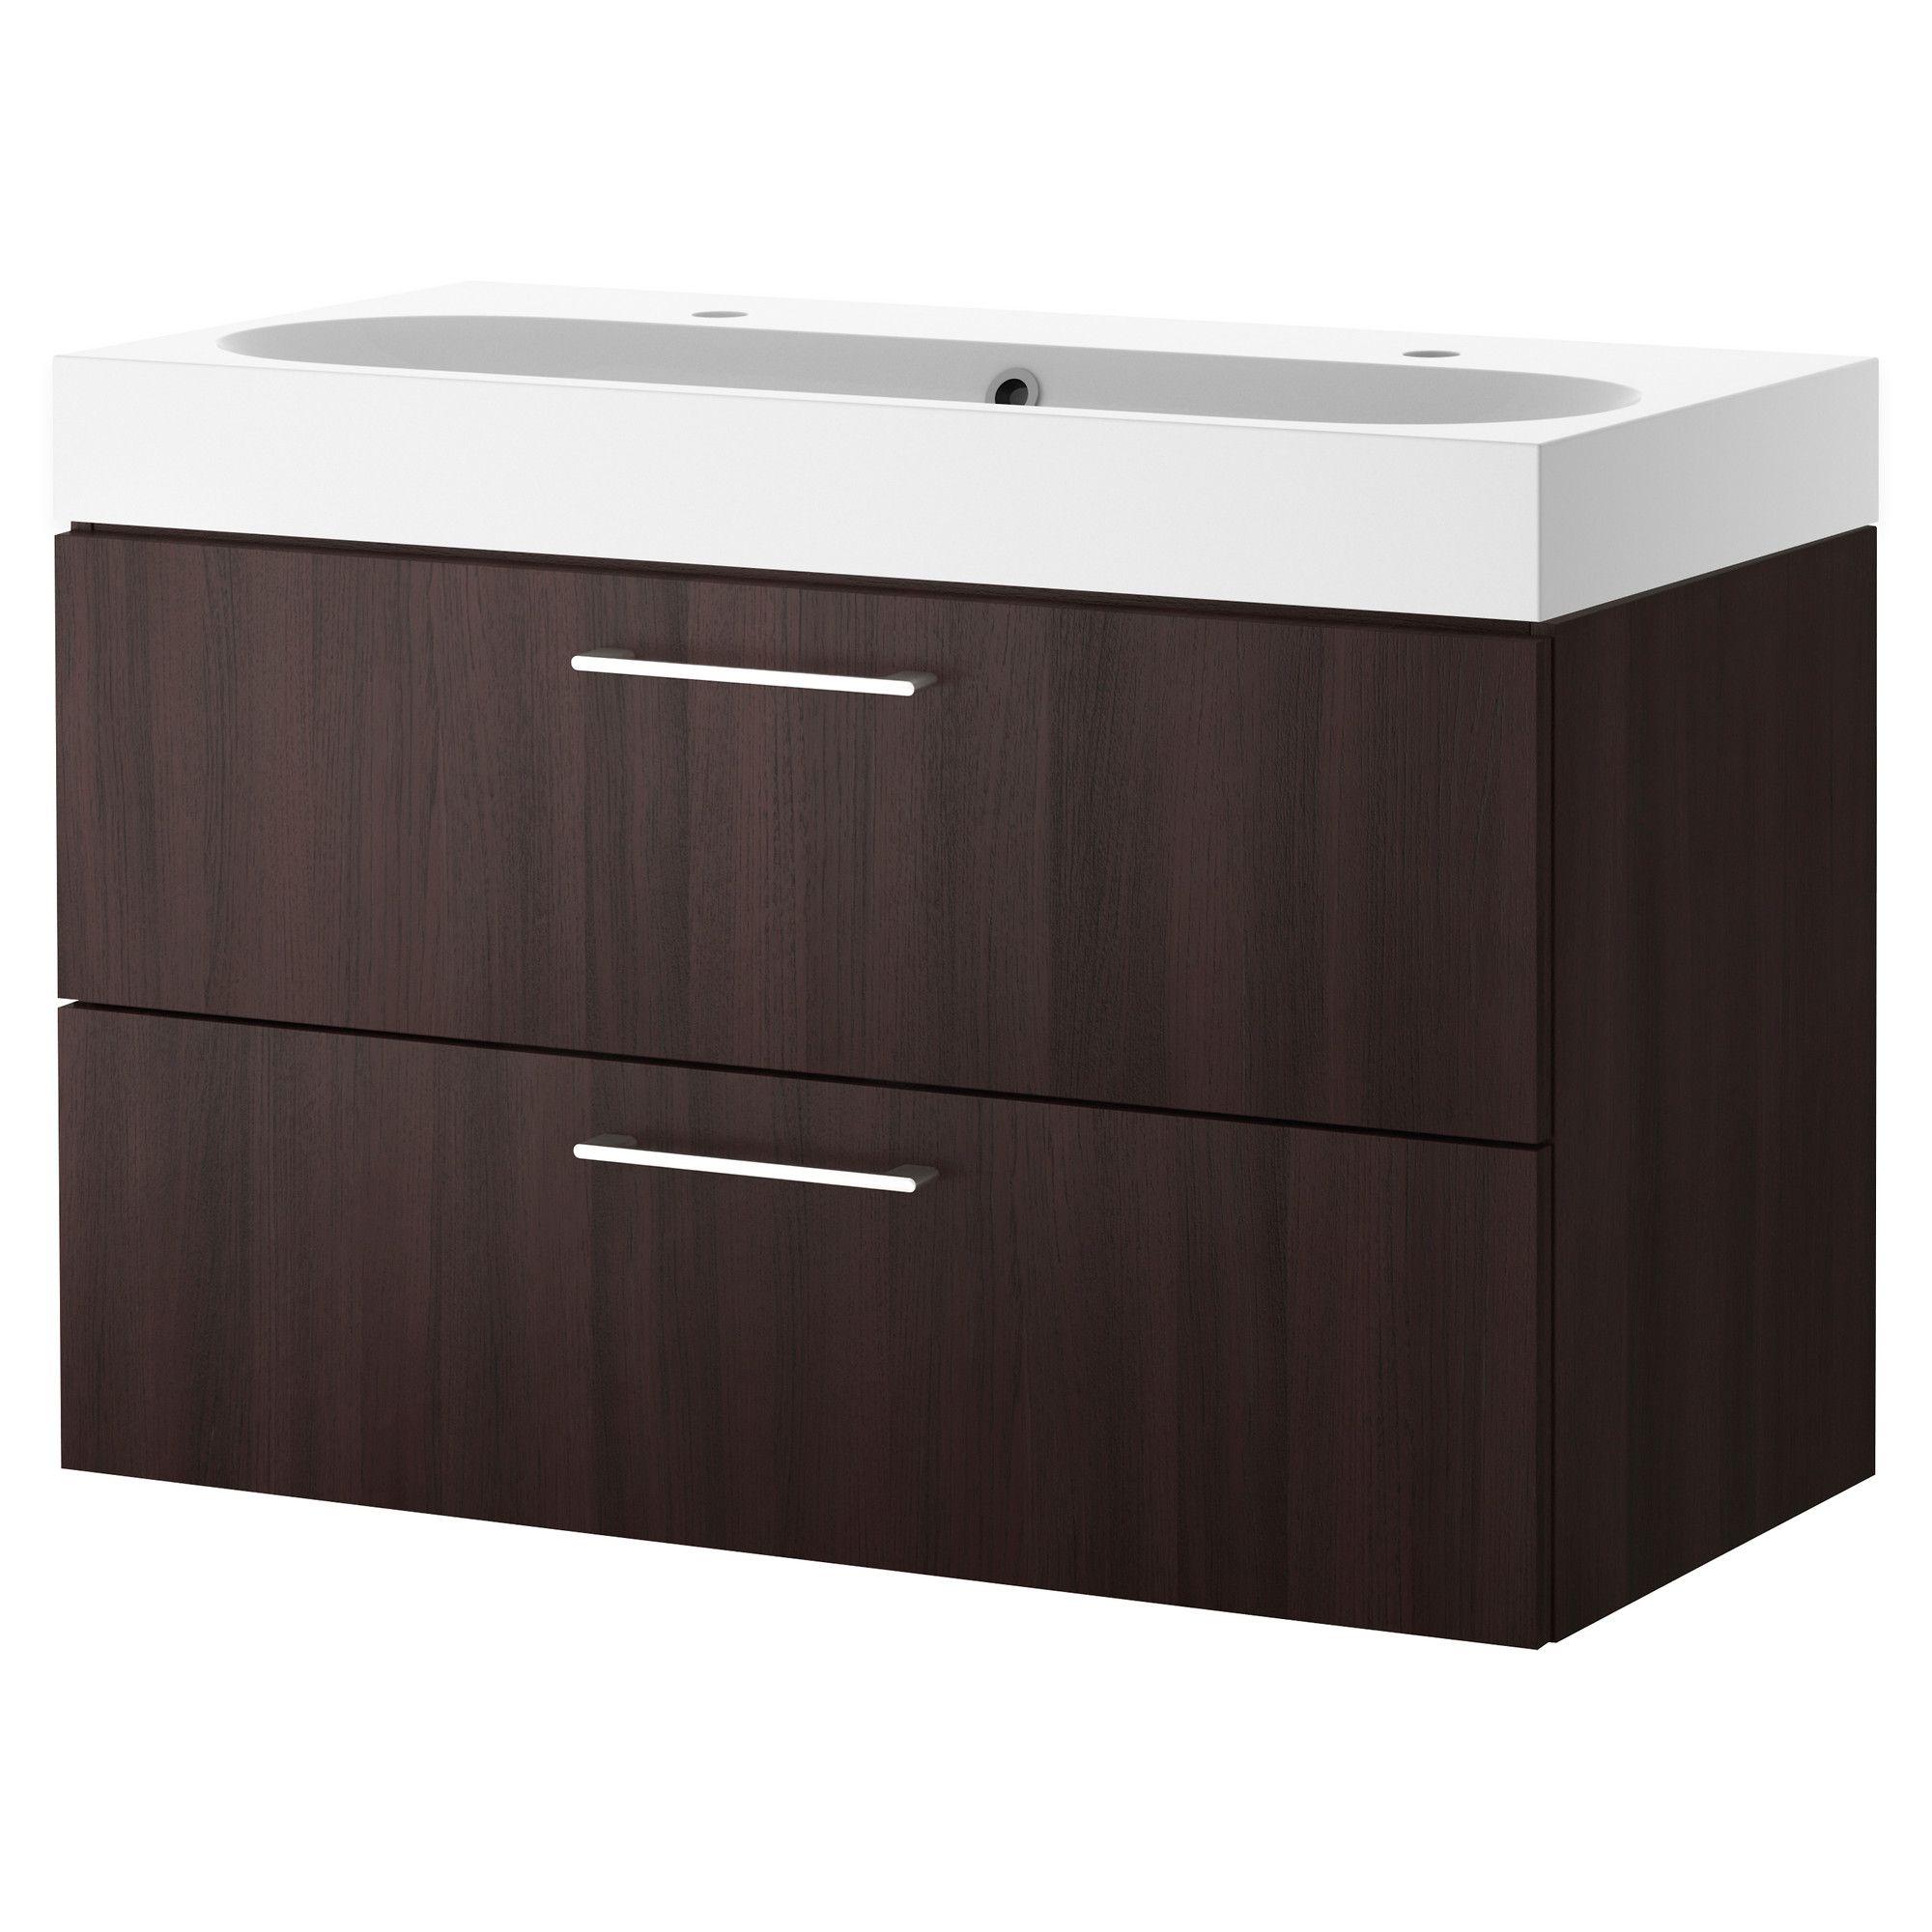 GODMORGON/BRÅVIKEN Meuble lavabo 2tir - brun noir - IKEA h68xl100xd49cm 349euros